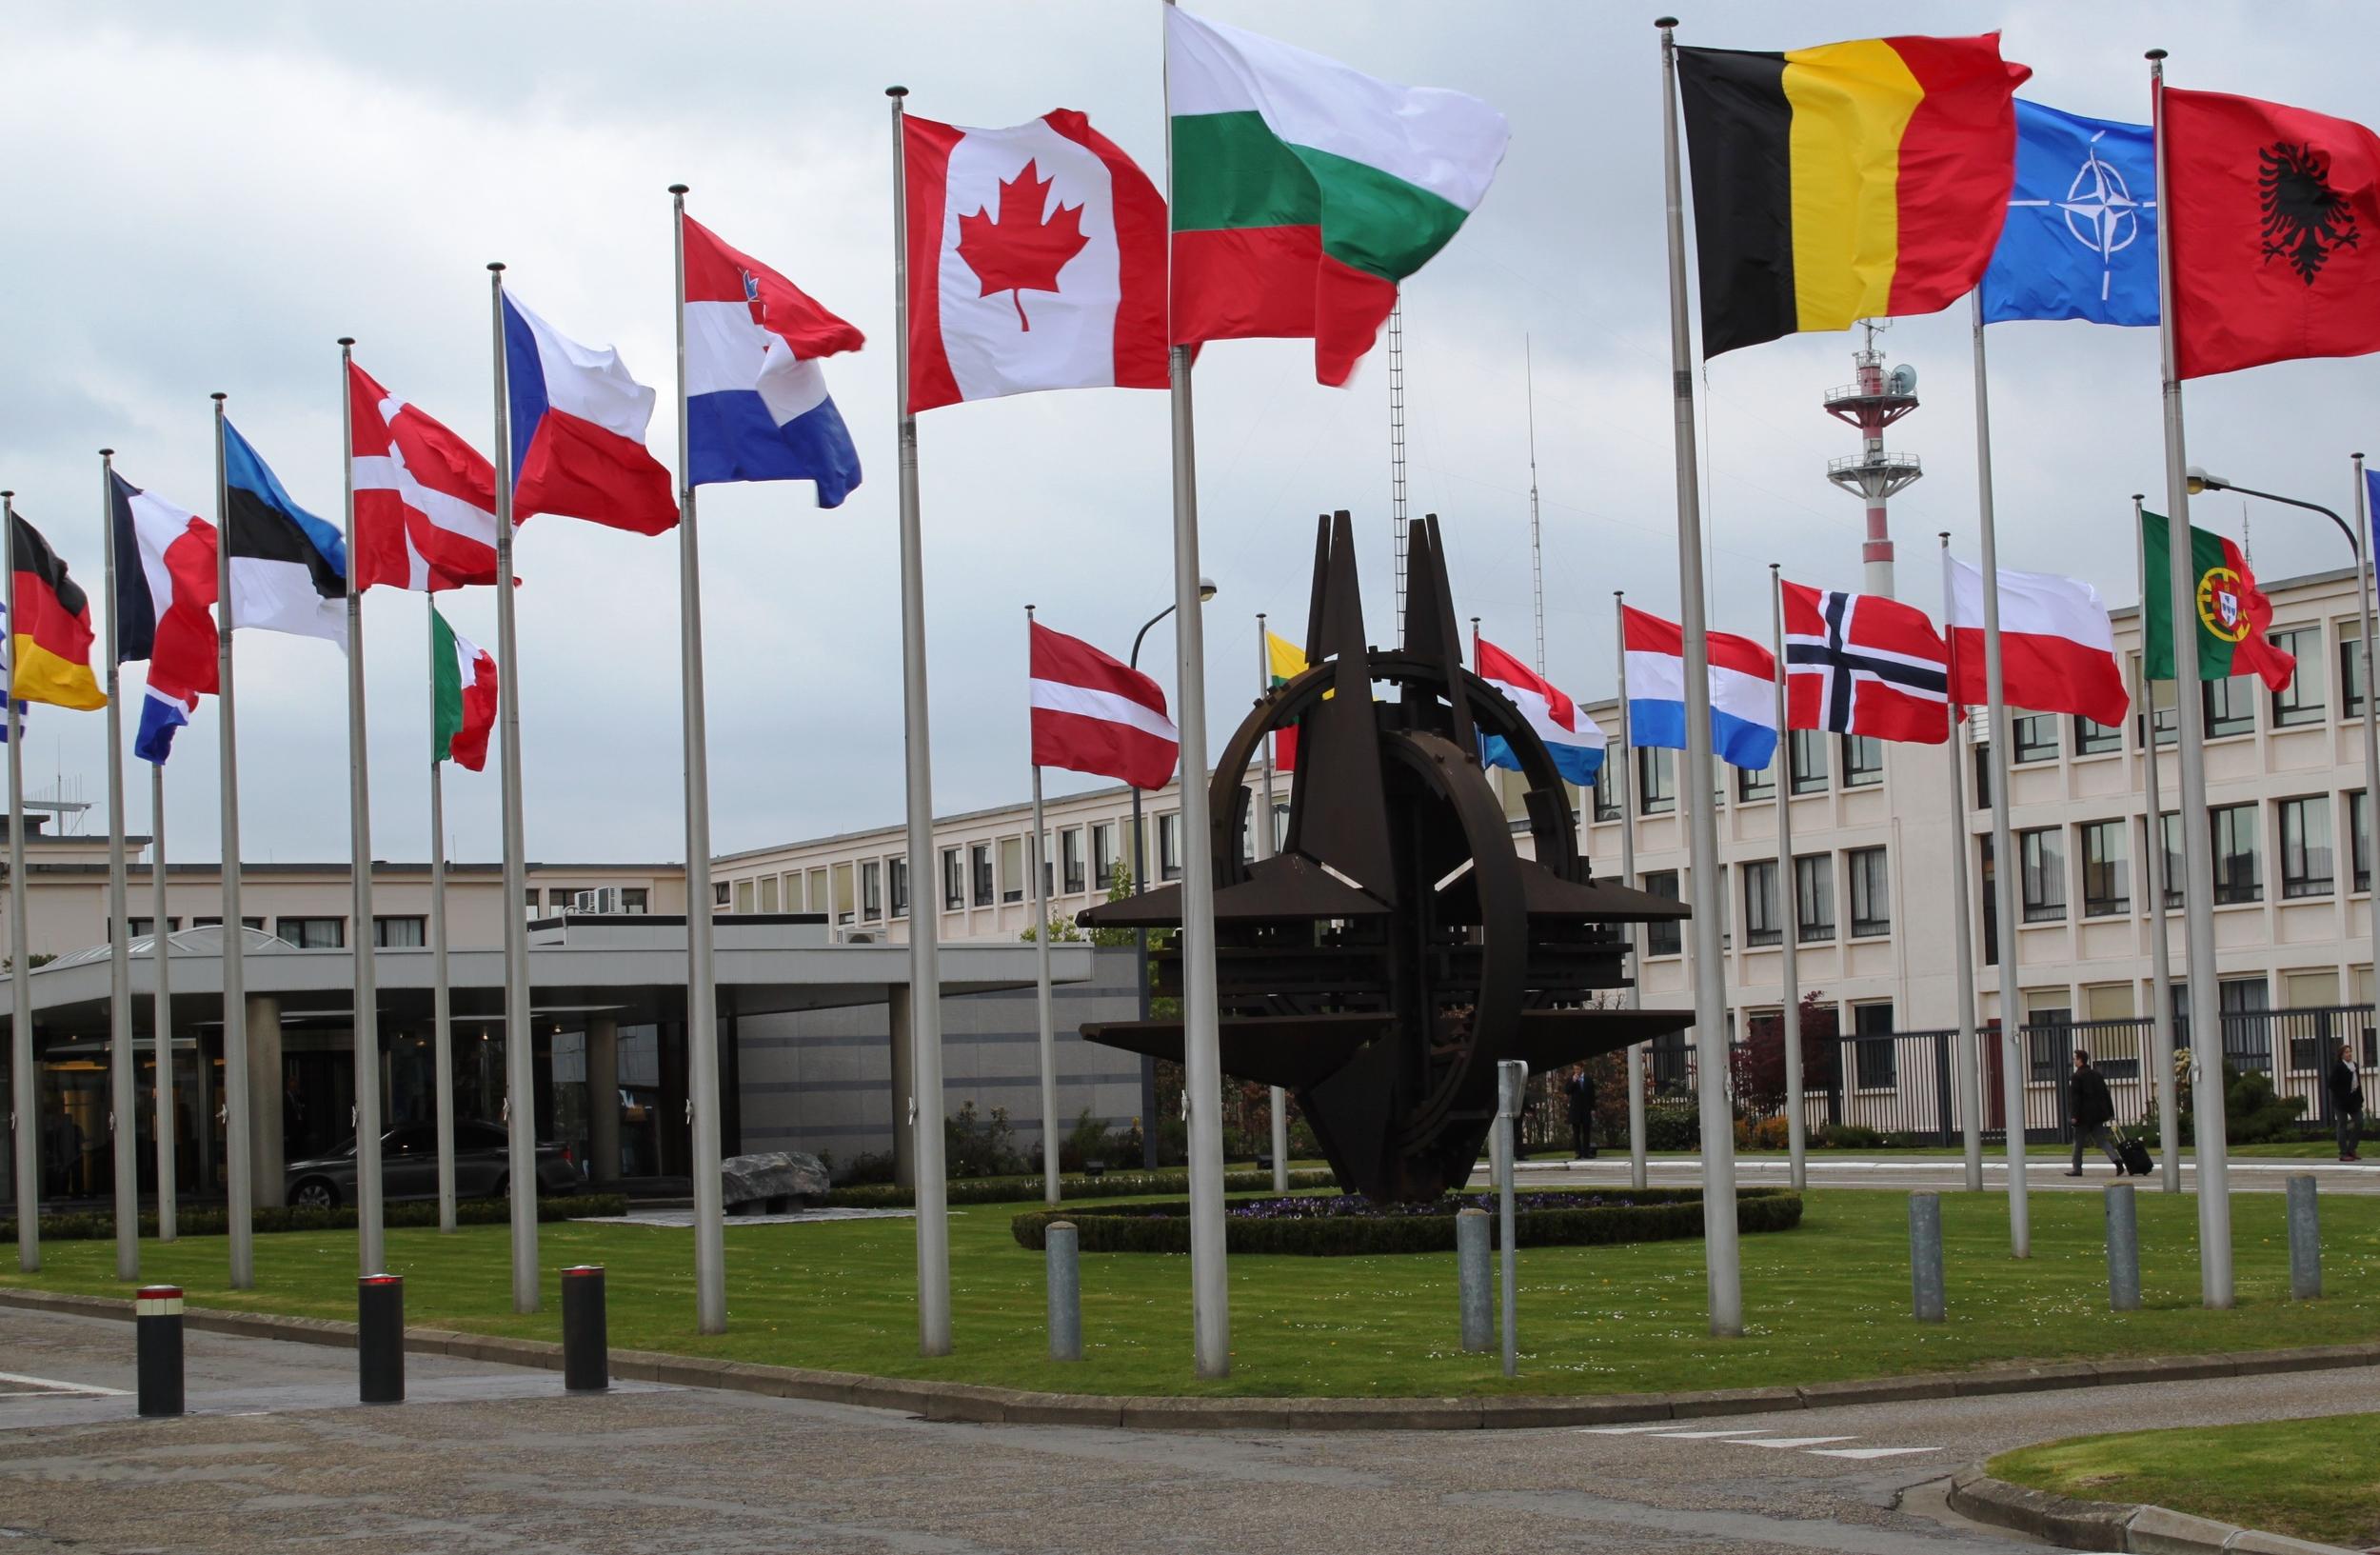 NATO HQ, Photo Credit: Utenriksdepartementet UD  via Flickr